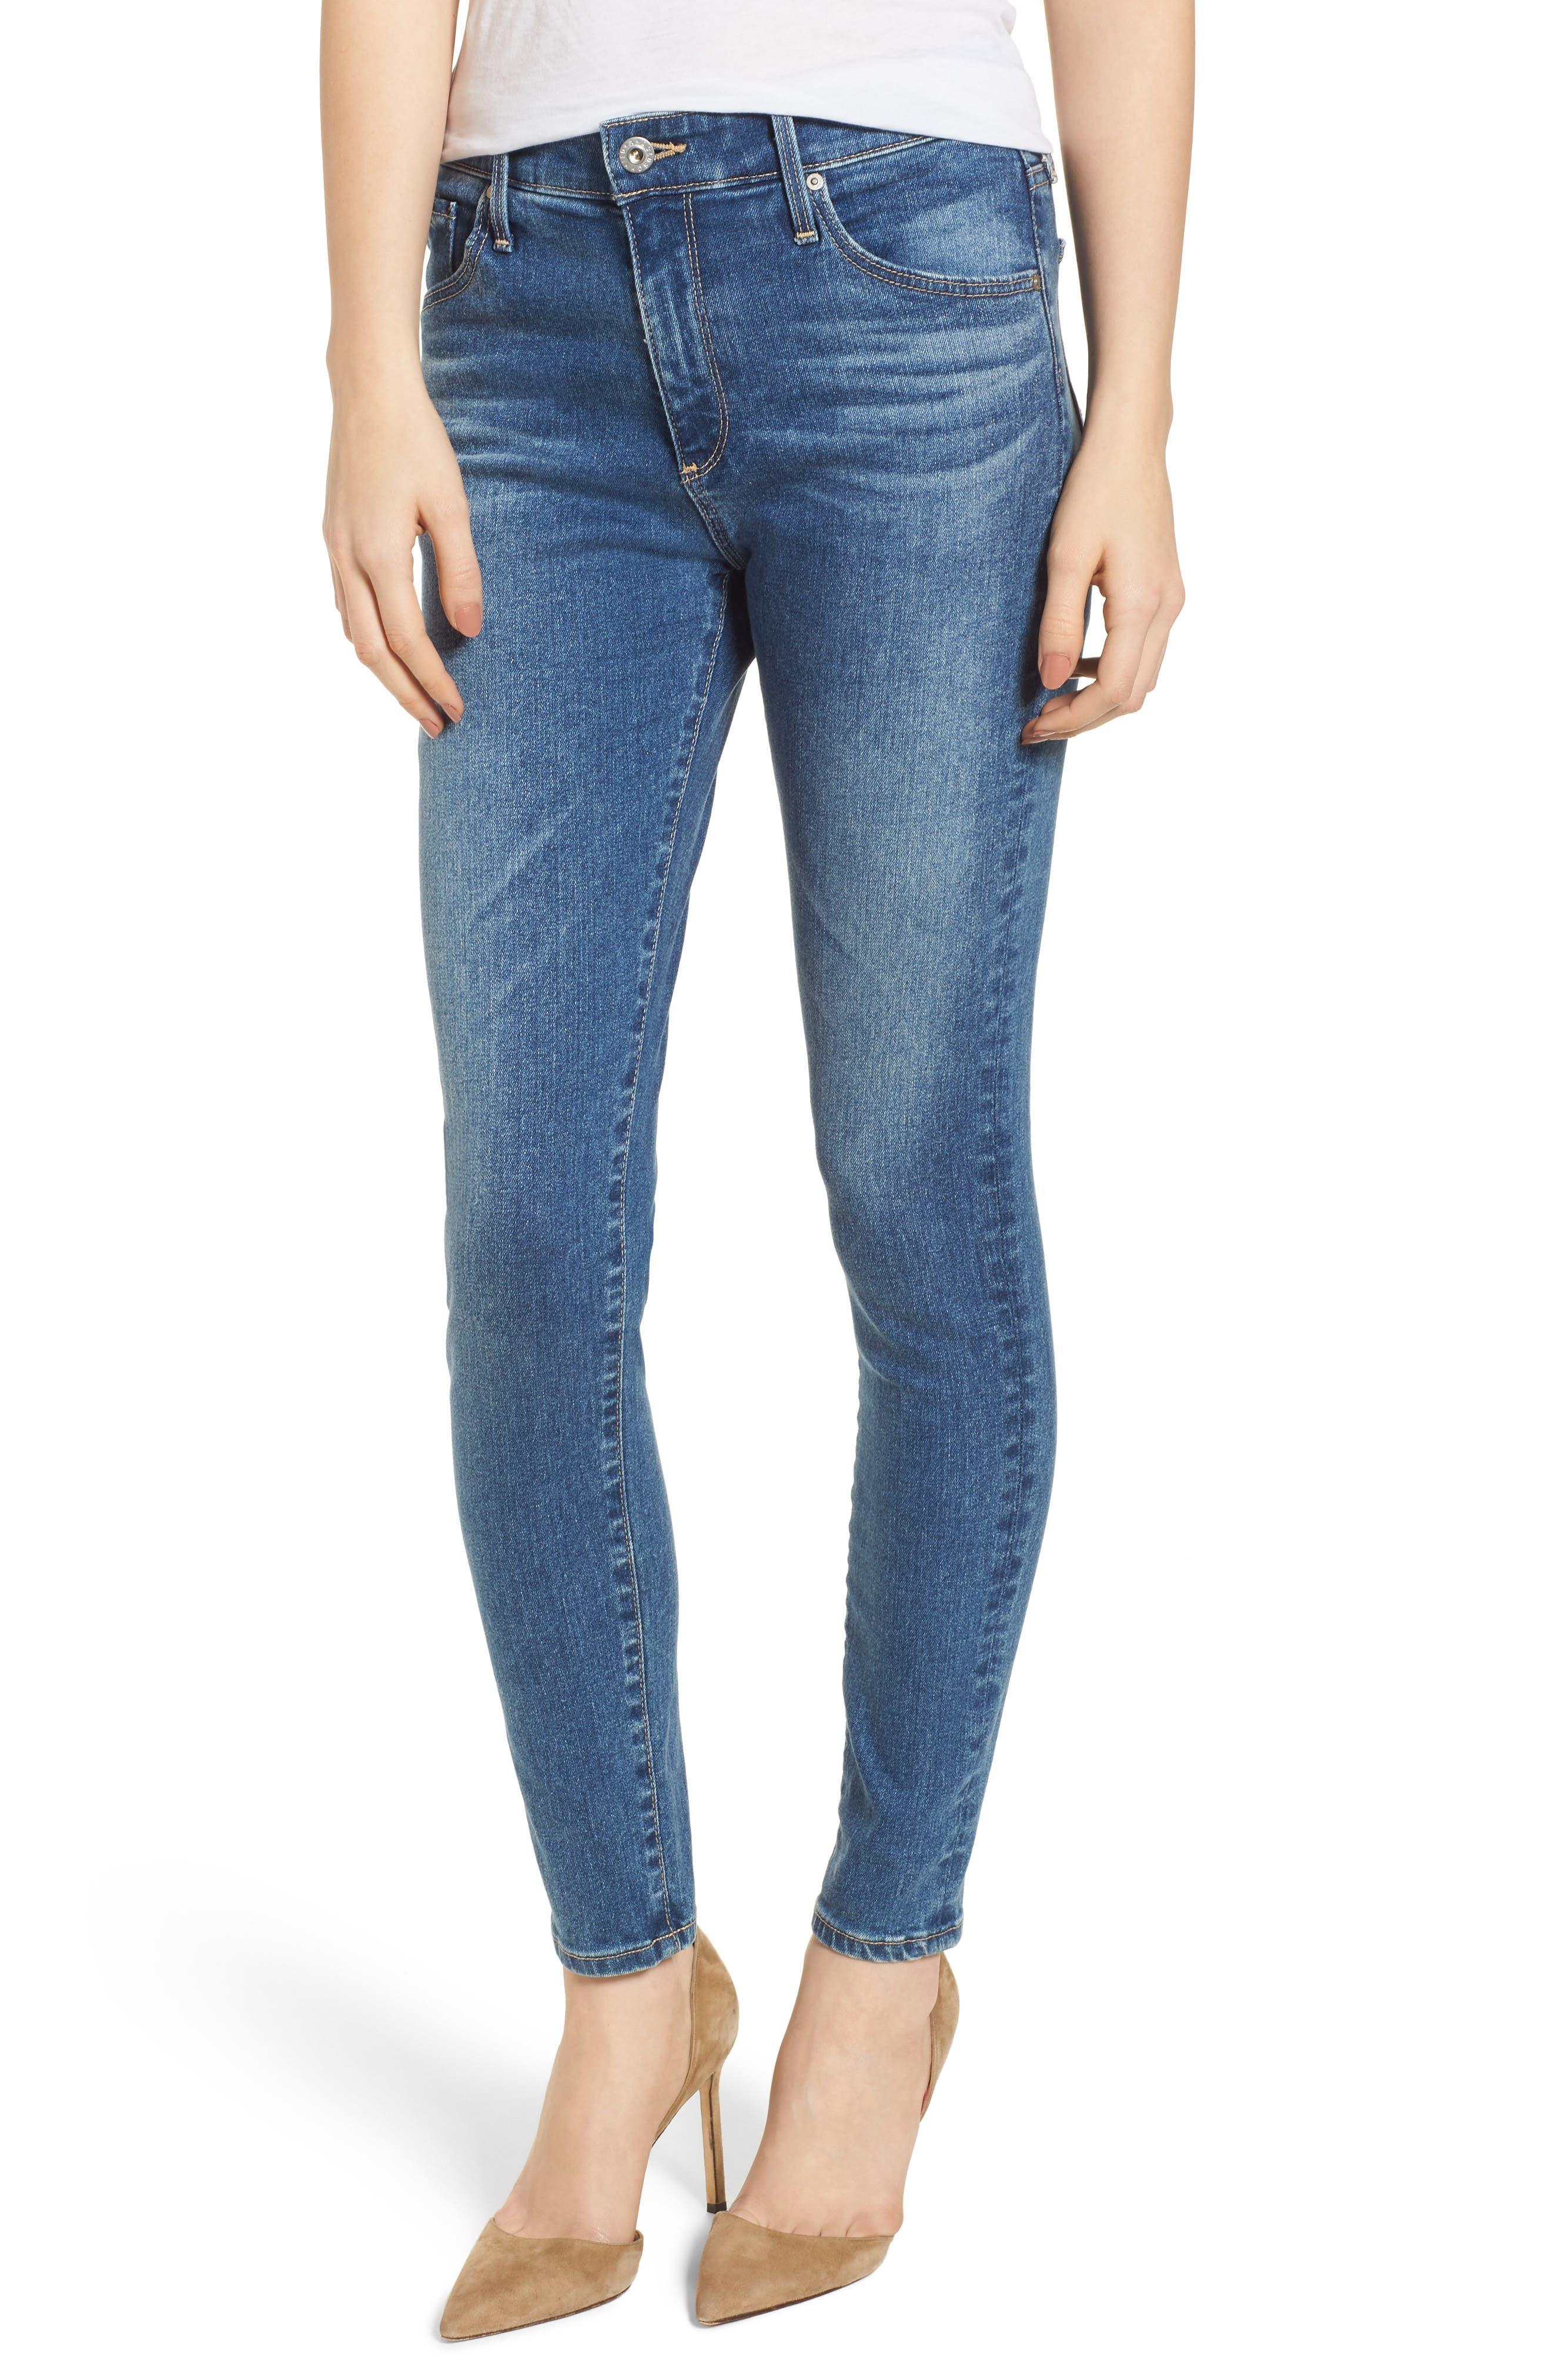 Alternate Image 1 Selected - AG The Farrah Ankle Skinny Jeans (California Blue)